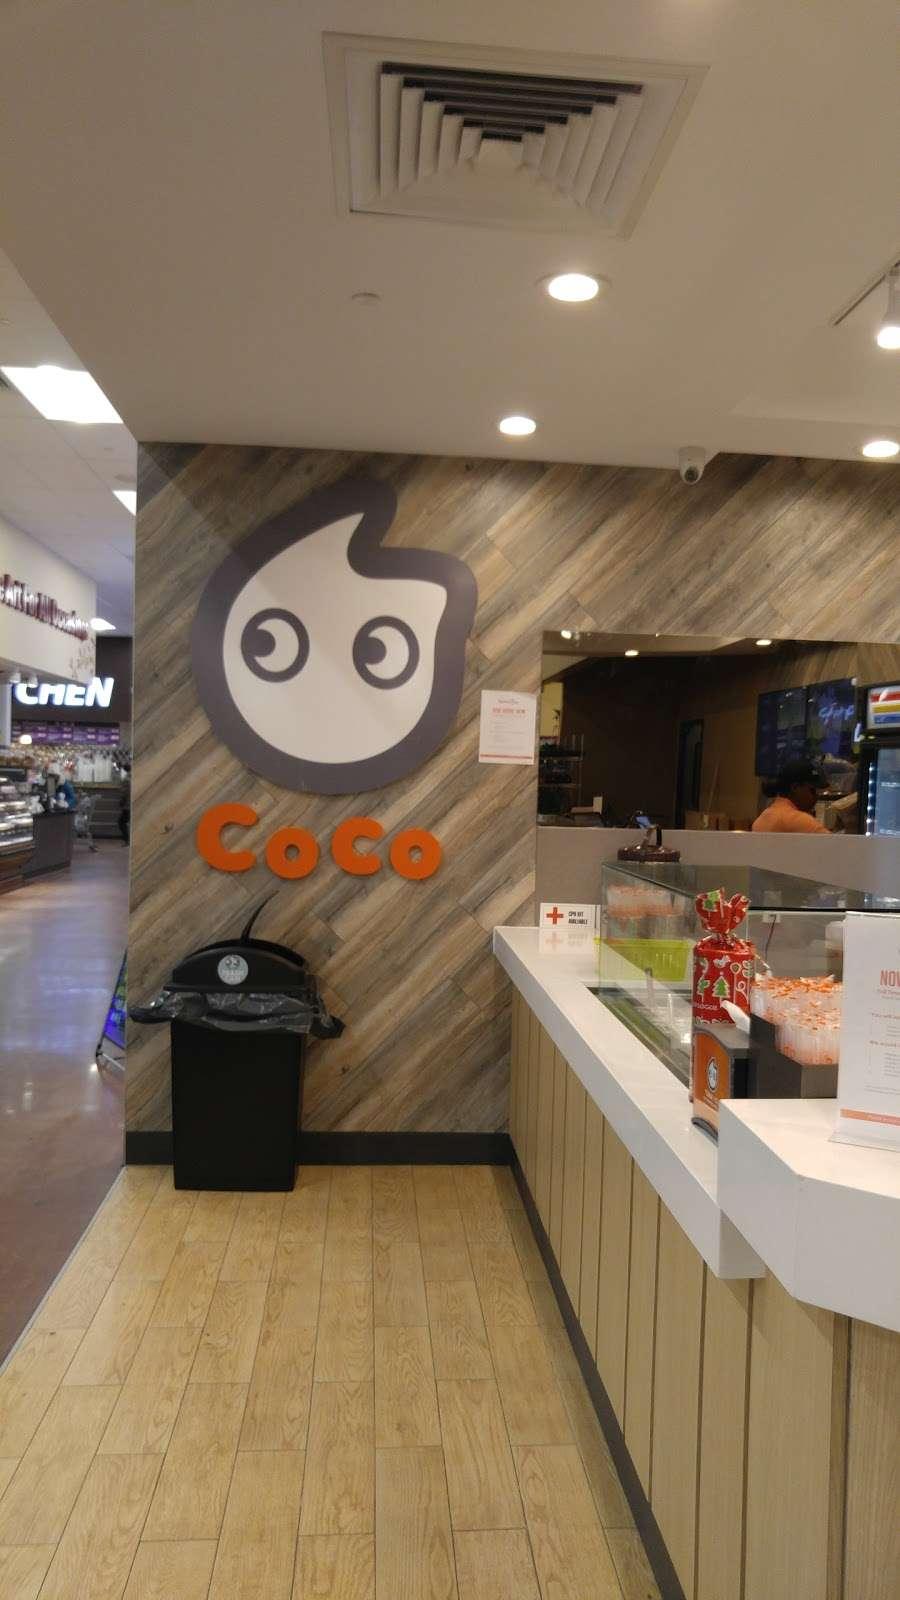 CoCo Fresh Tea & Juice - cafe  | Photo 2 of 8 | Address: 420 Grand St, Jersey City, NJ 07302, USA | Phone: (201) 763-7375